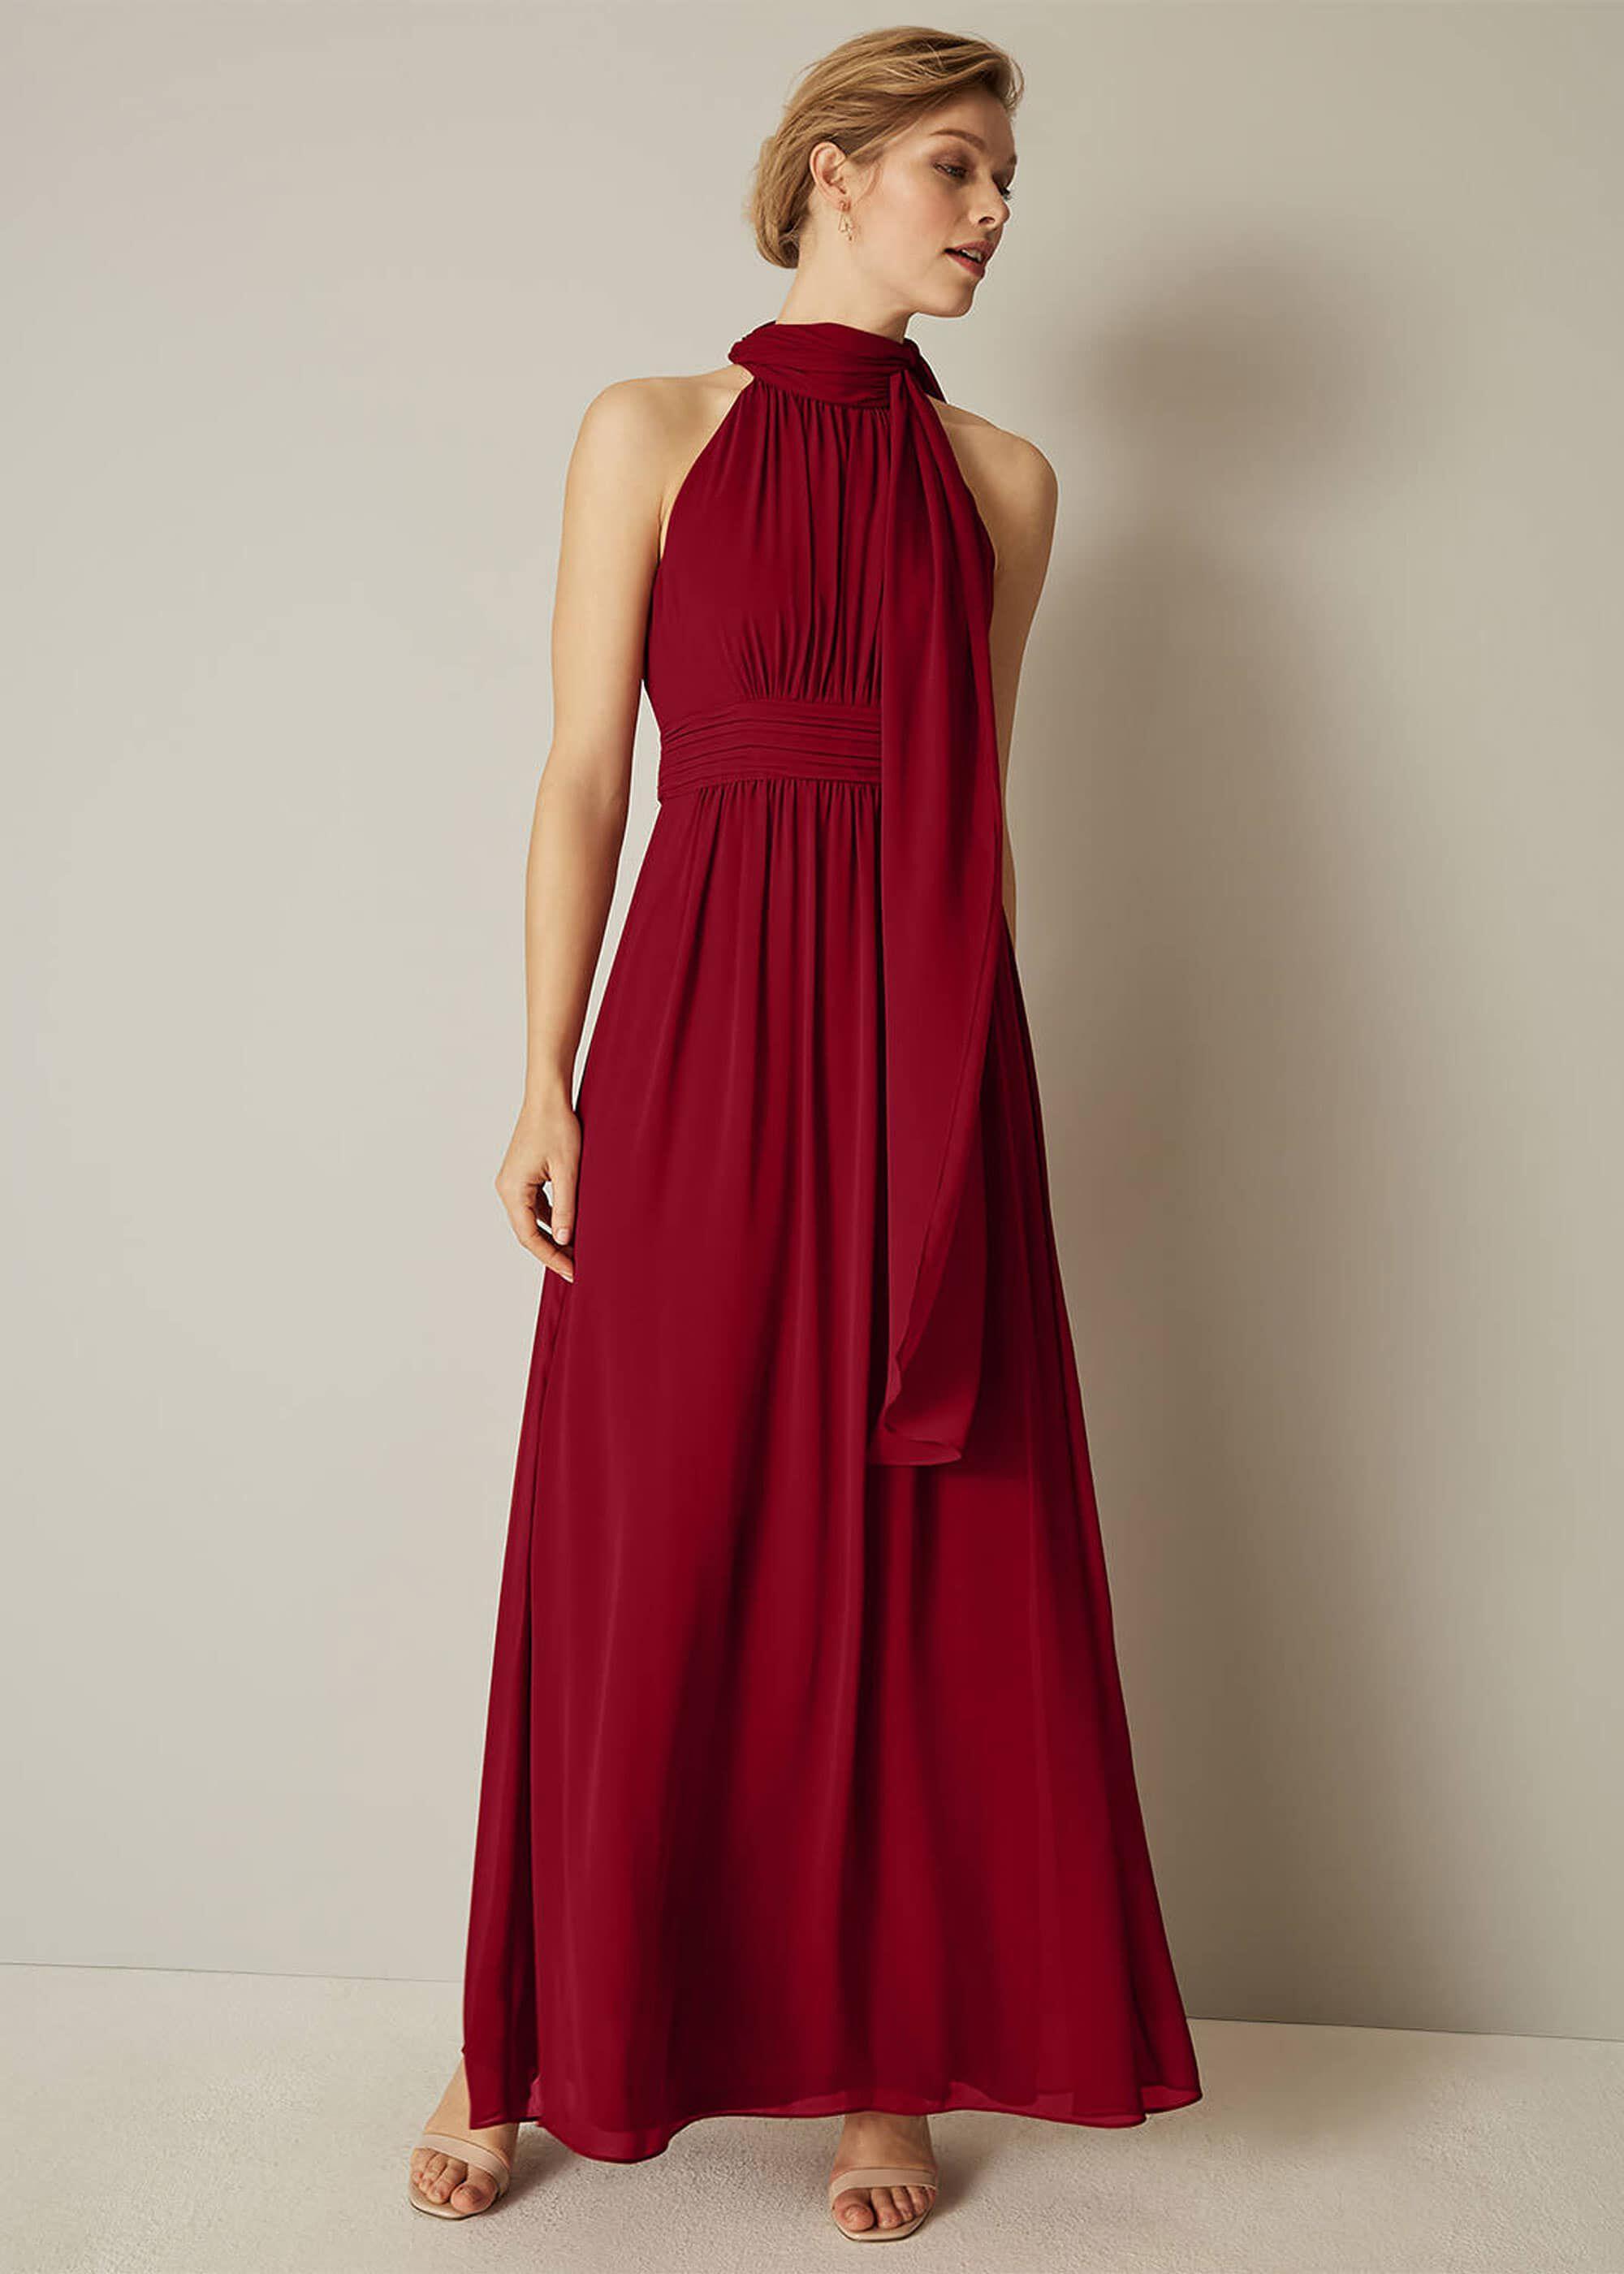 Roxi Maxi Bridesmaid Dress | Phase Eight